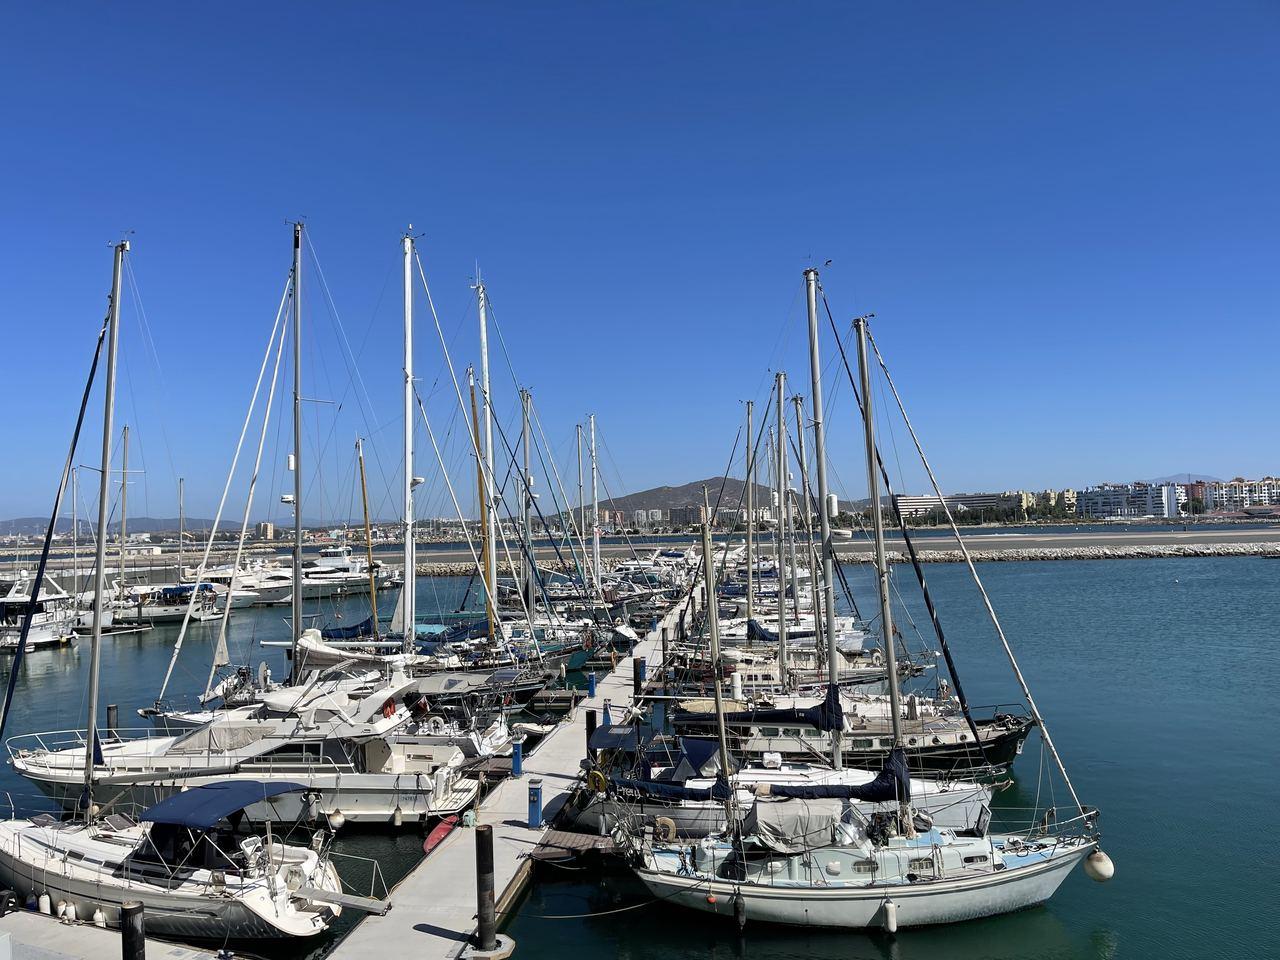 view of the marina NewsZetu.com-Breaking news, international news, Business news, Sports news